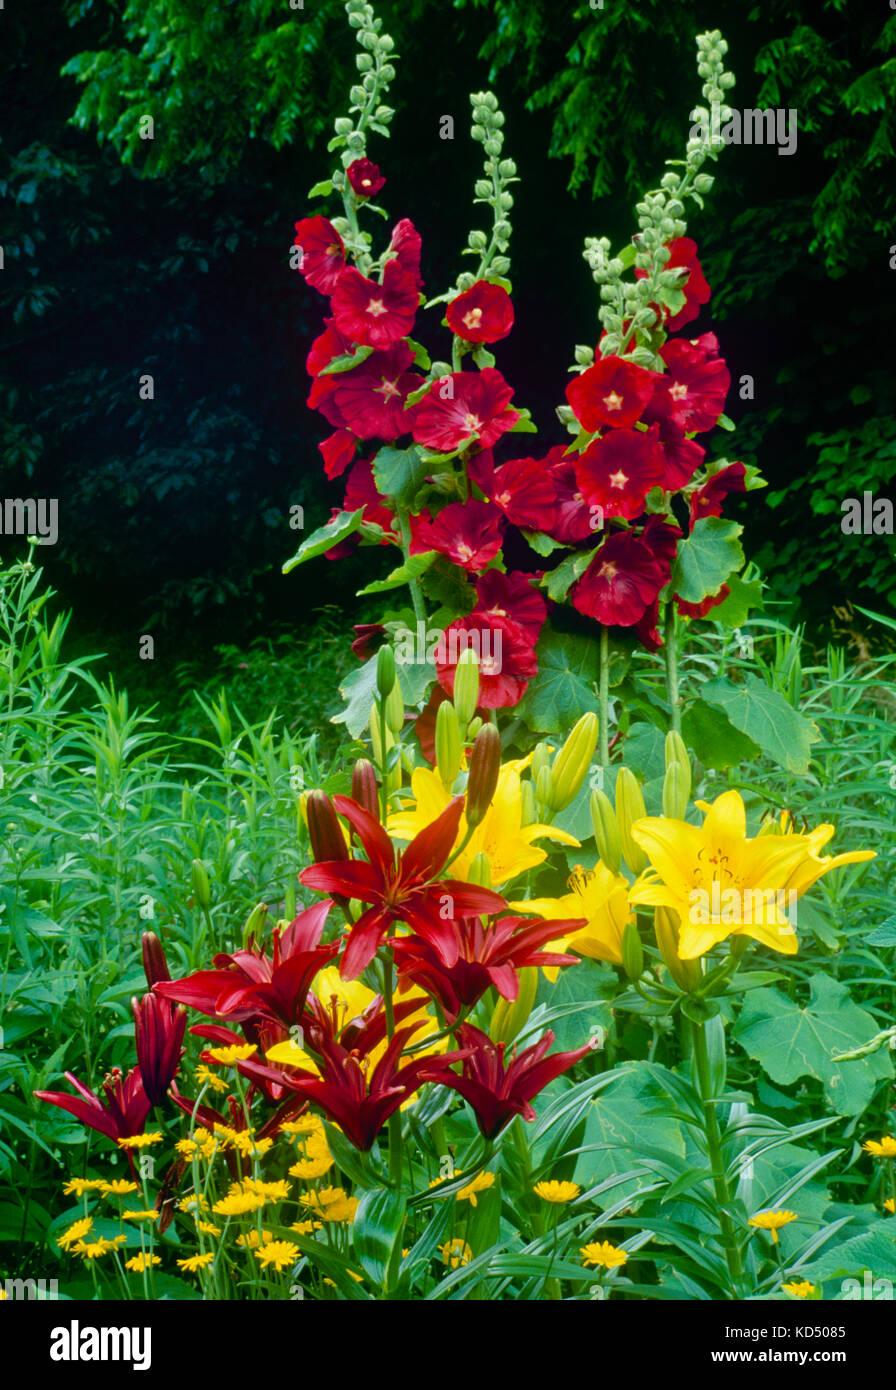 Rote Stockrosen mit passenden Lillies in Country Garden, Midwest USA Stockbild